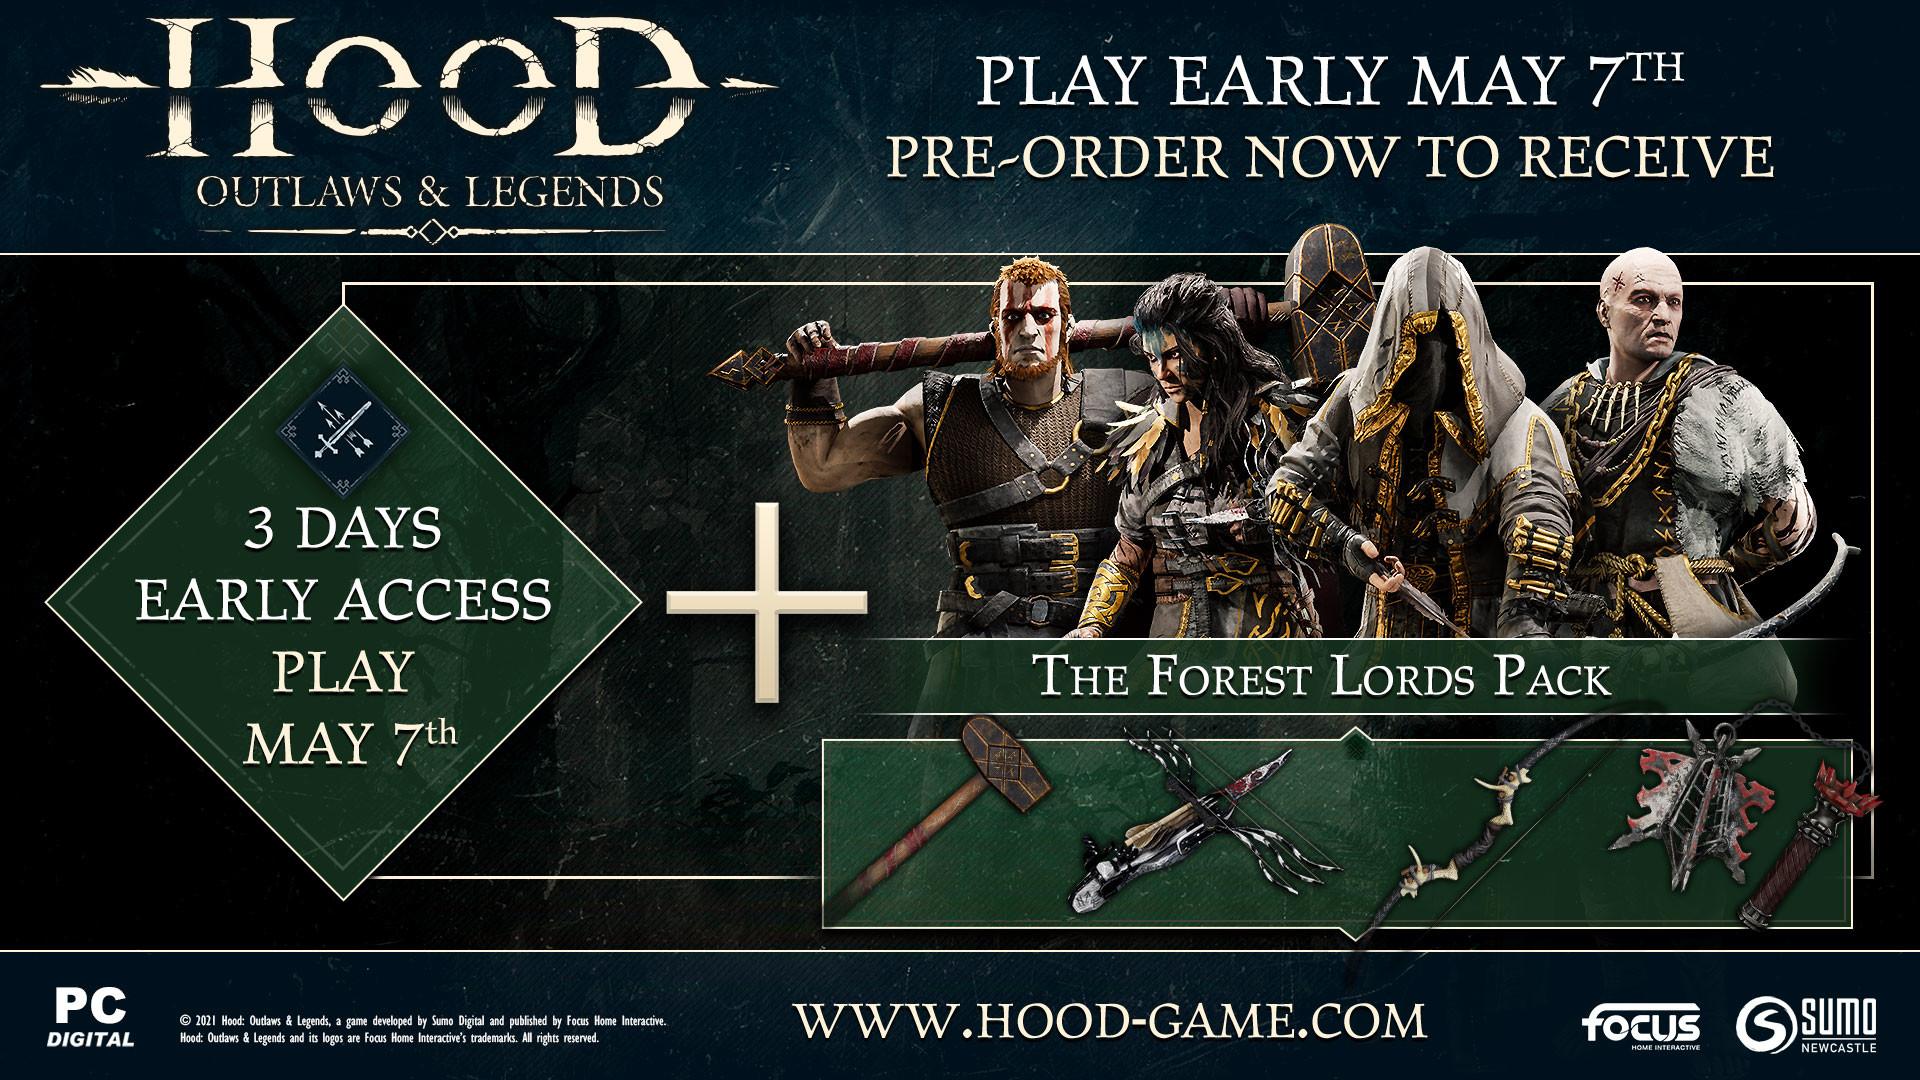 Multiplayerové Hood: Outlaws & Legends má datum vydání Preorder